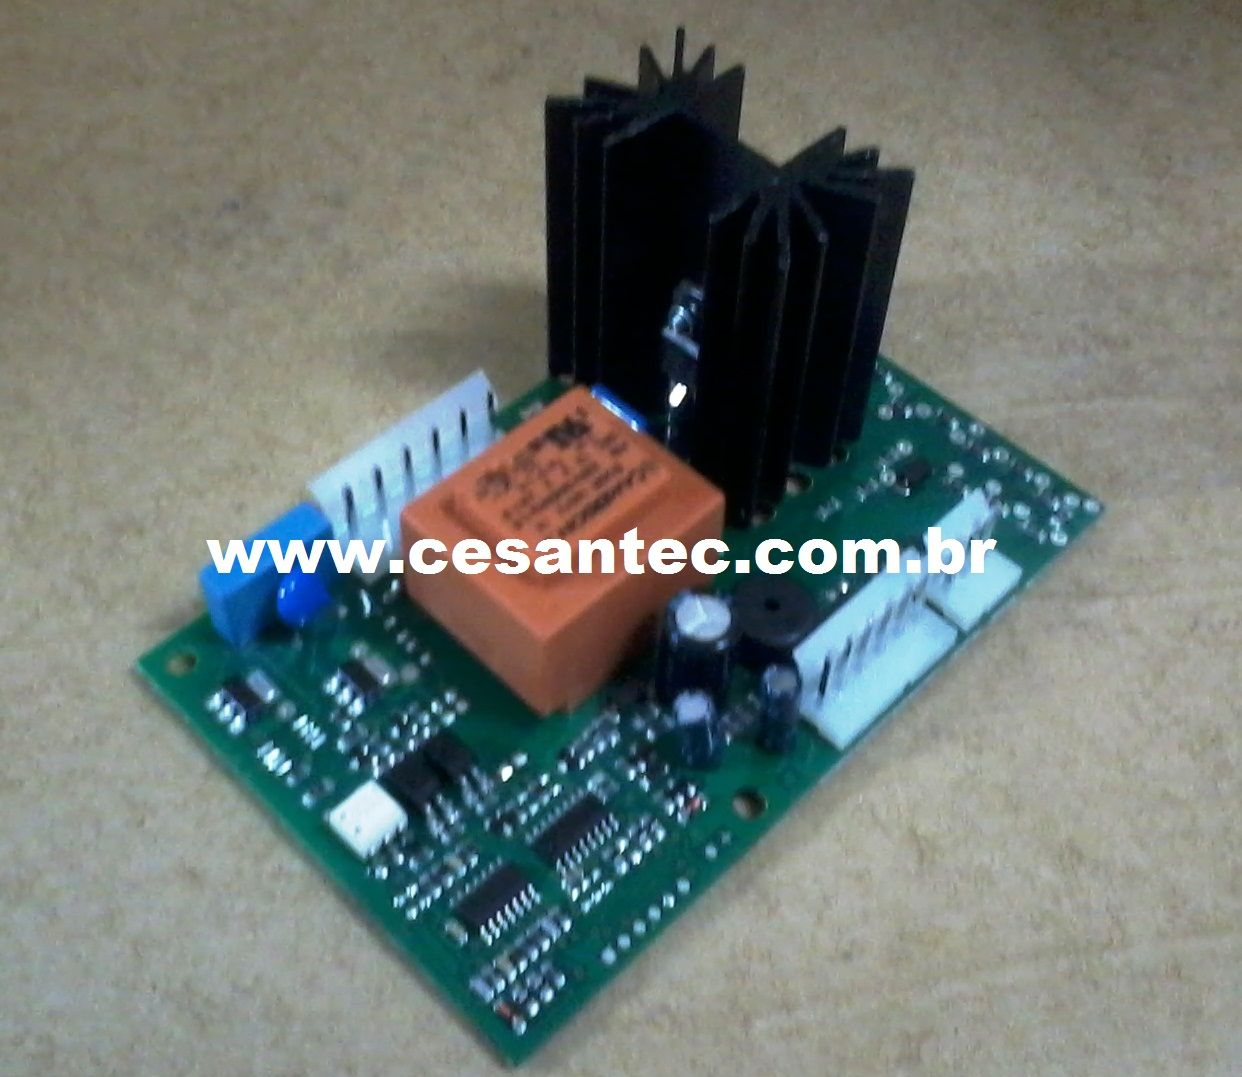 Placa eletronica de controle GV ETNA - Lavor Pro